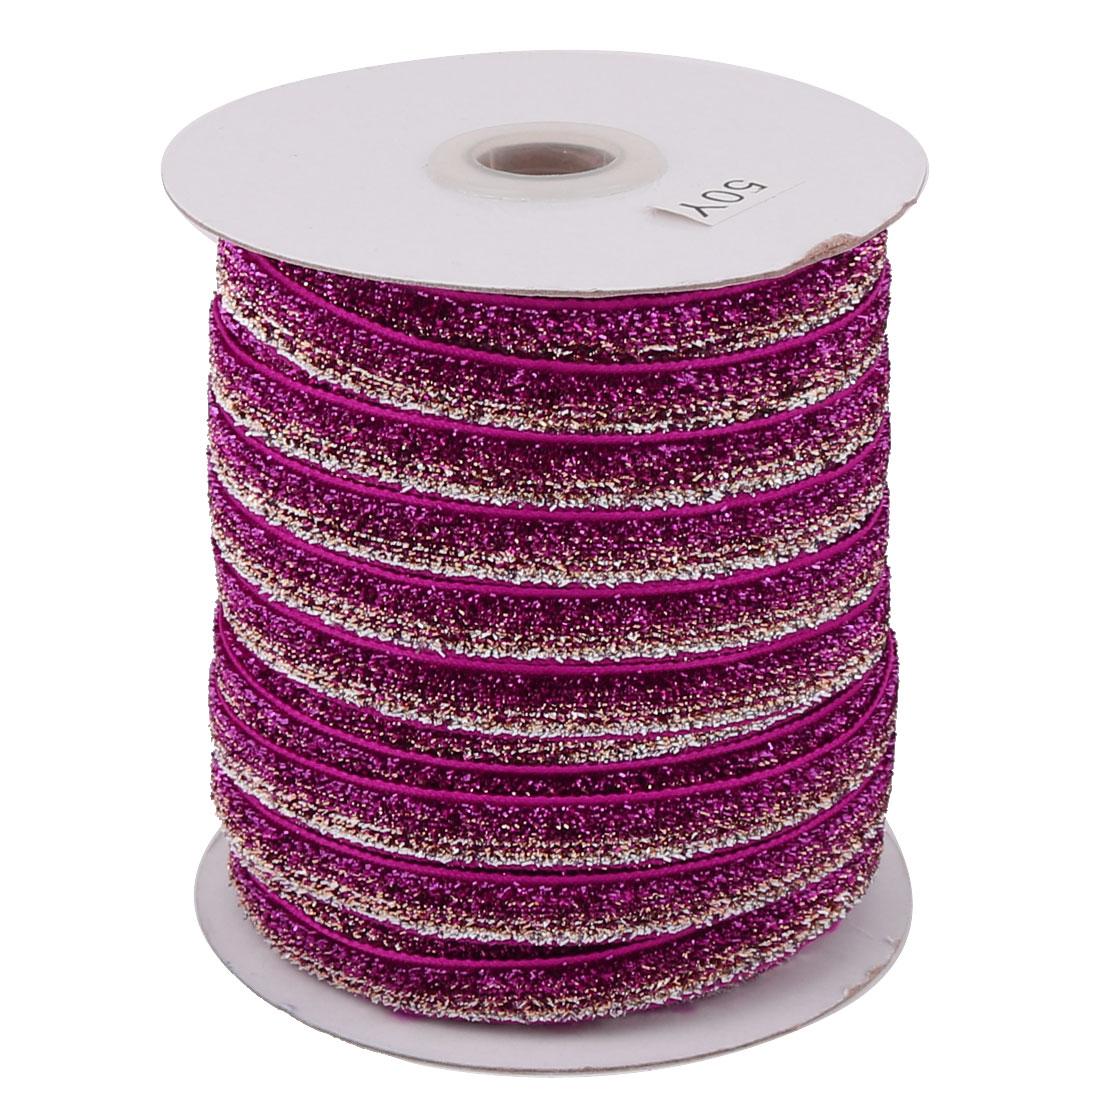 Family Decoration Velvet Bling Ribbon Multifunction DIY Handcraft Fuchsia Silver Tone